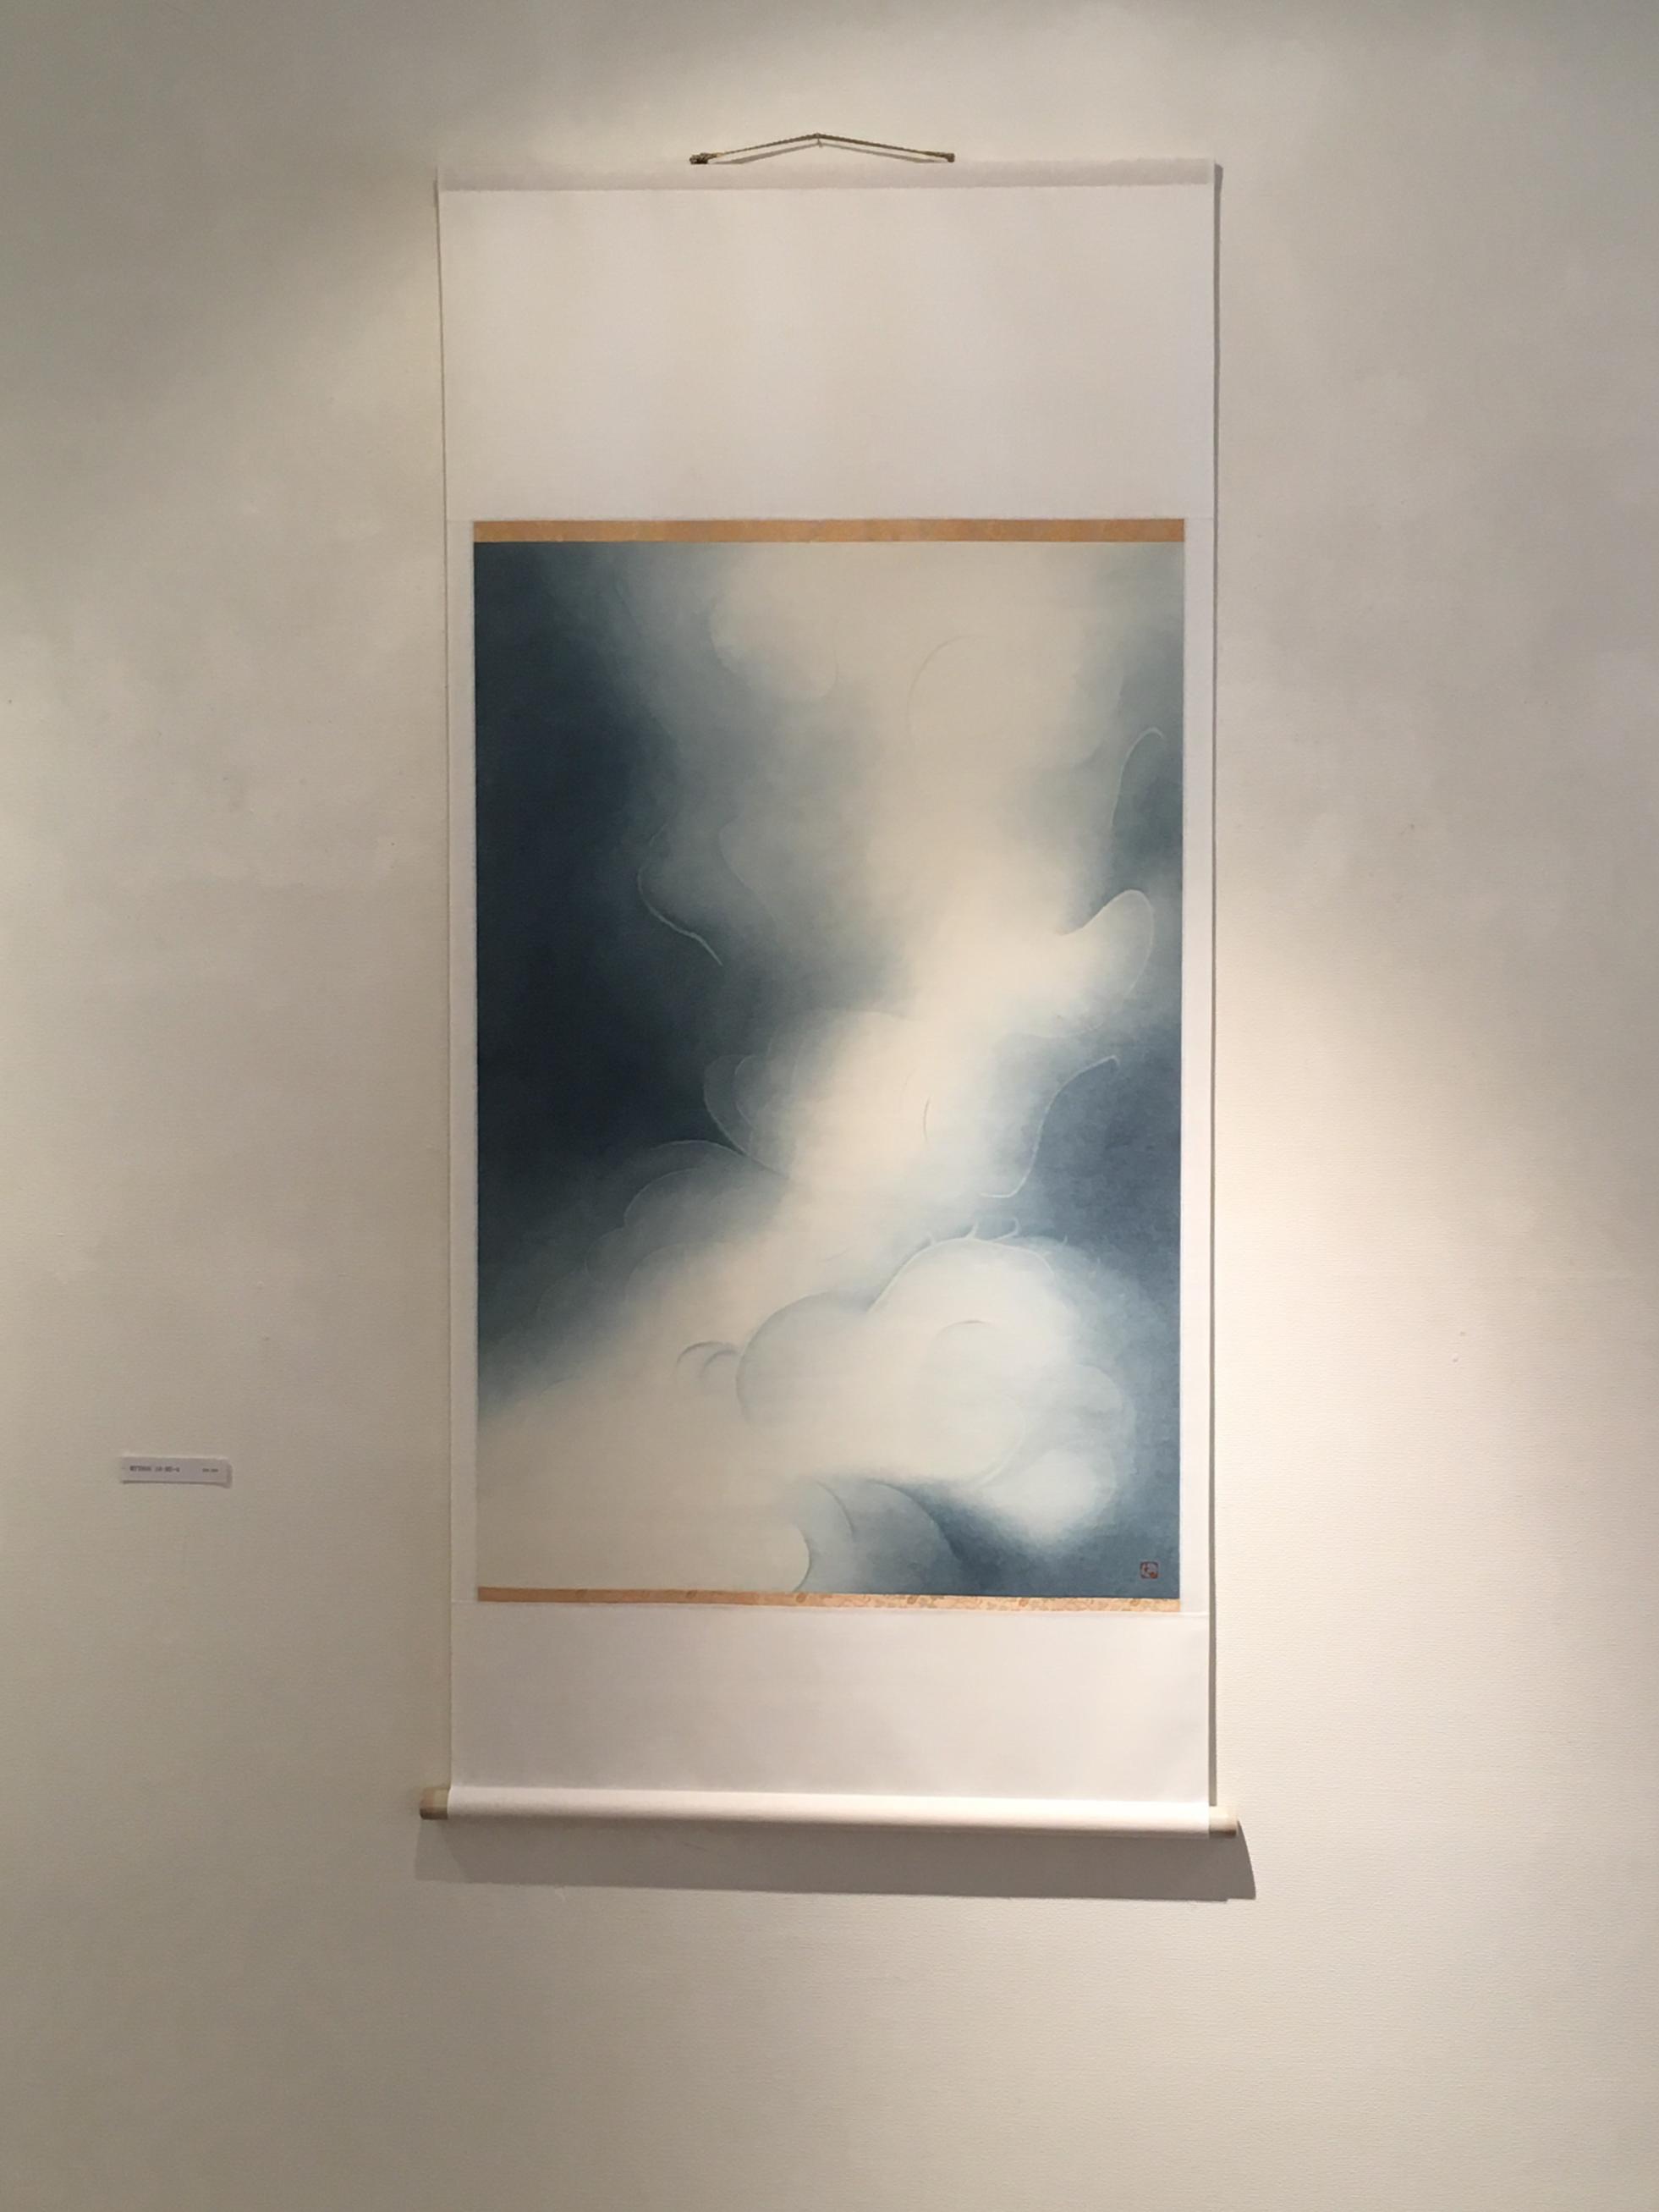 SHIMOMUKAI Keiko, works of Japanese paper, pigments, and resin glue